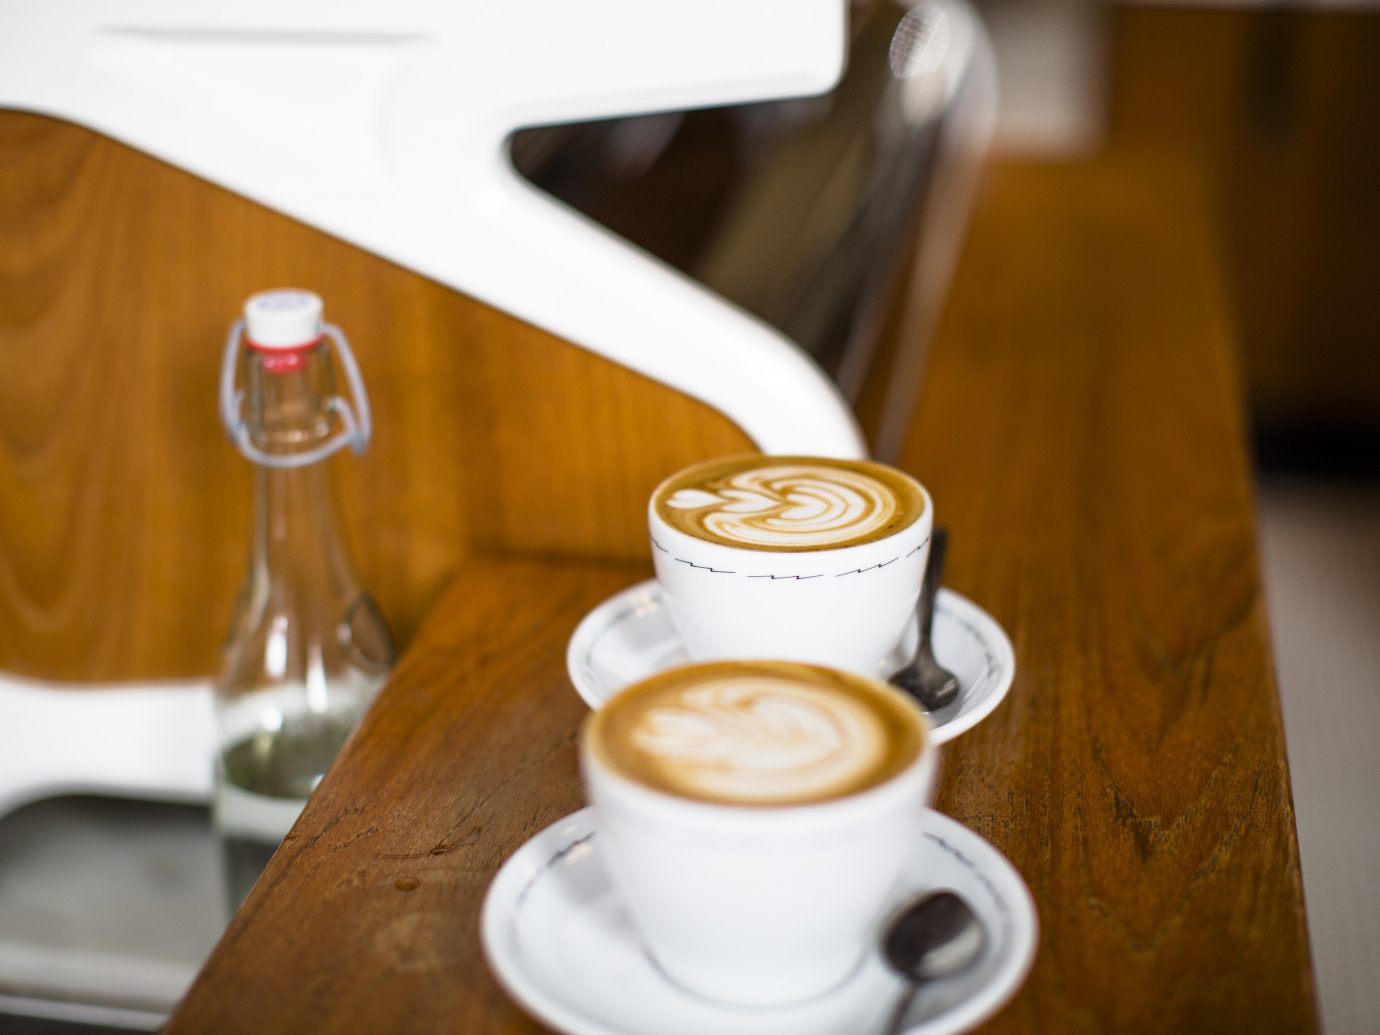 Food + Drink Offbeat Travel Trends cup table coffee indoor cappuccino espresso caffè macchiato wiener melange latte flat white Drink cortado café au lait ristretto café coffee cup doppio mocaccino cuban espresso caffeine flavor caffè americano coffeehouse coffee milk